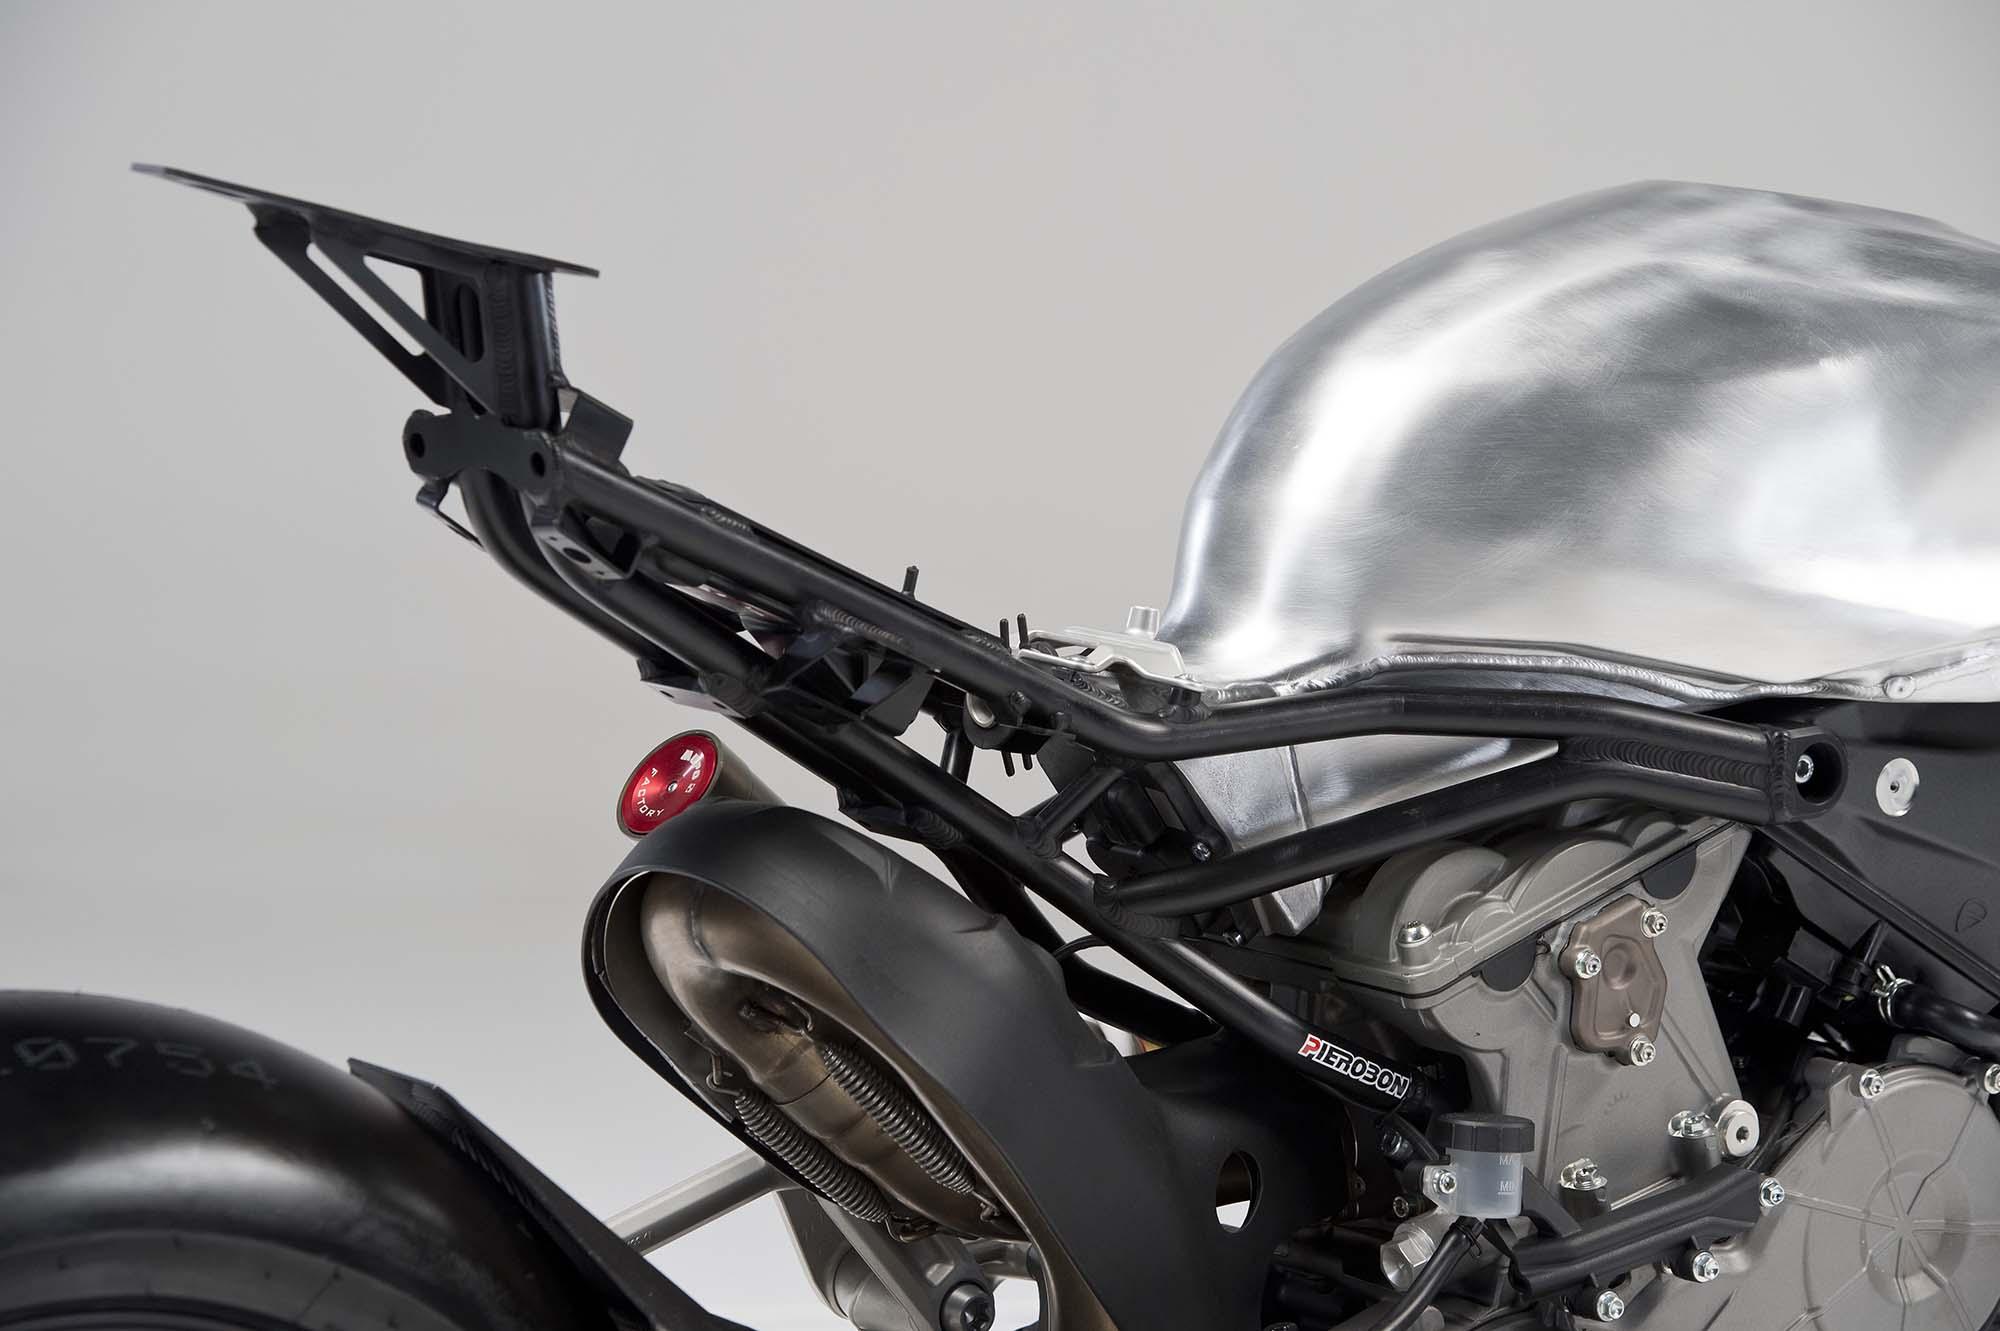 Pierobon S Take On The Ducati 899 Panigale Asphalt Amp Rubber